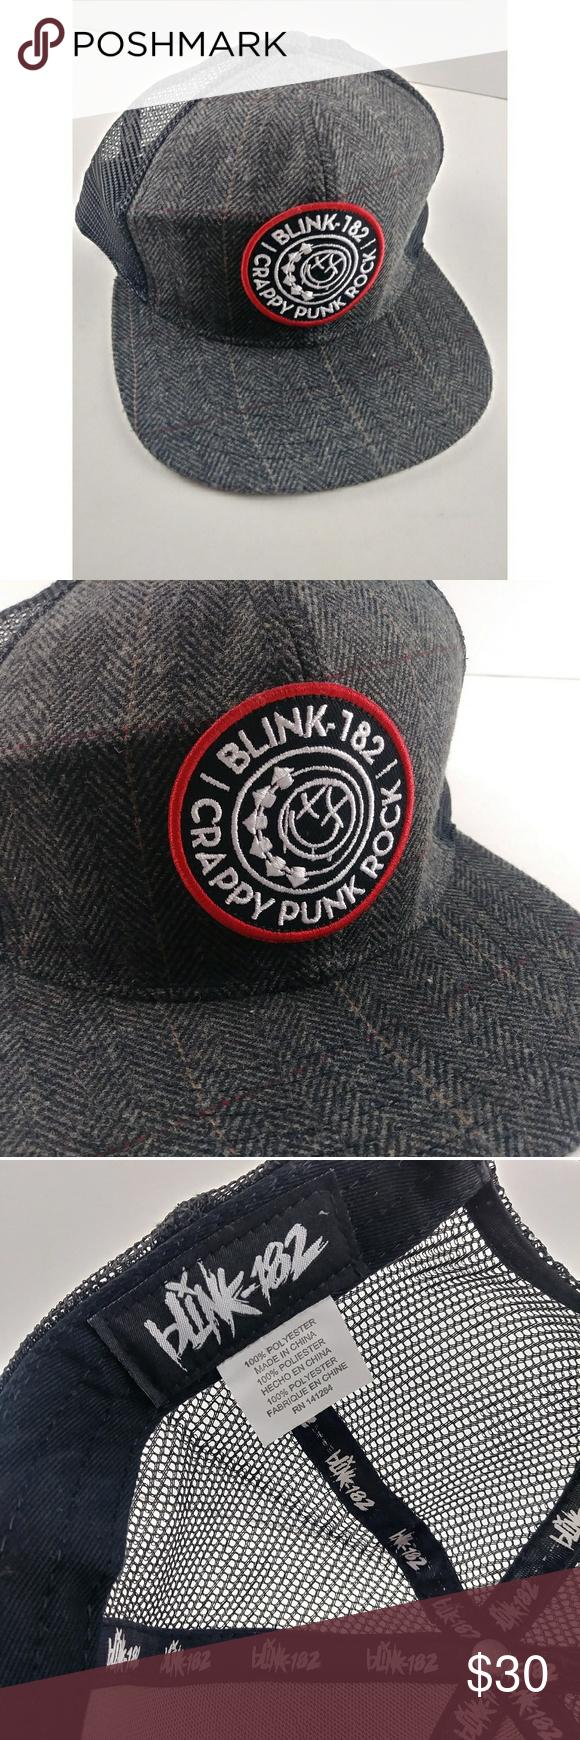 Blink 182 Crappy Punk Rock Snapback Trucker Plaid Blink 182 Crappy Punk Rock Sna…